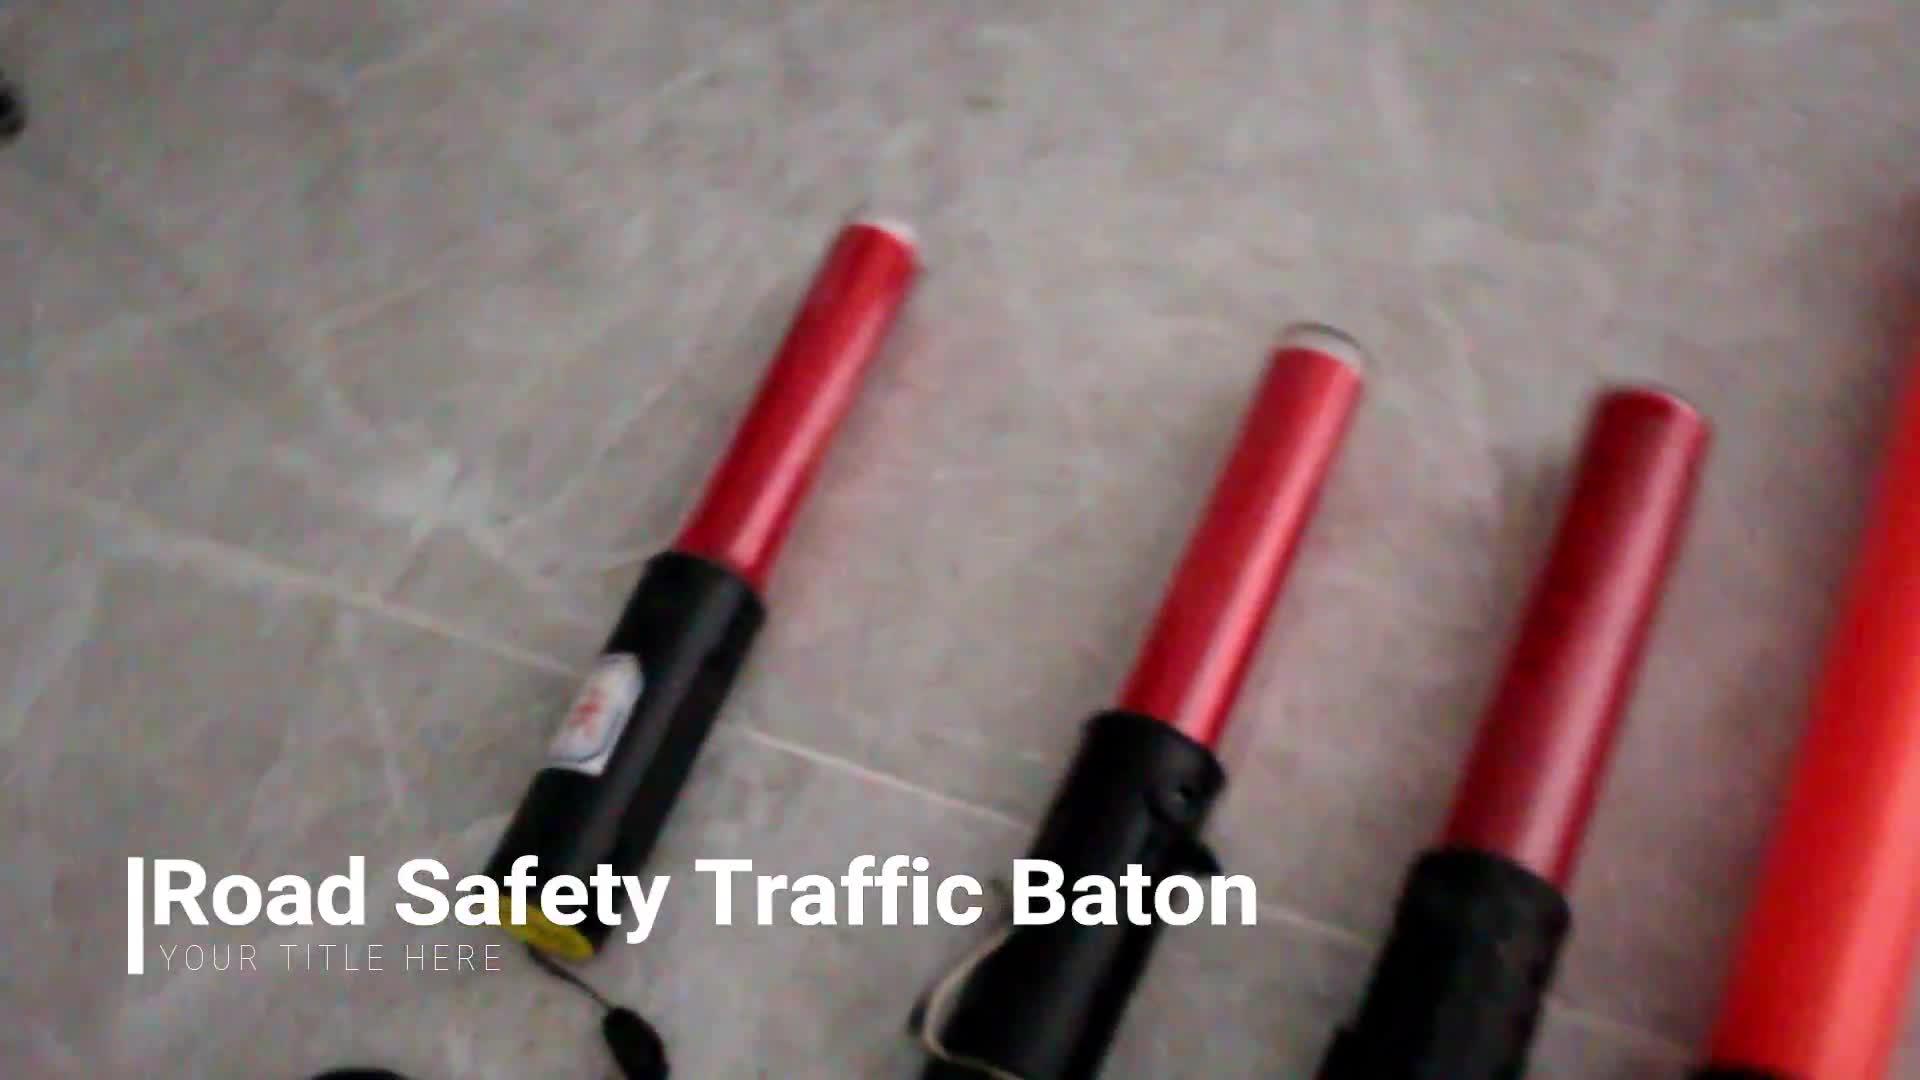 540mm different color flashing light stick led police traffic baton